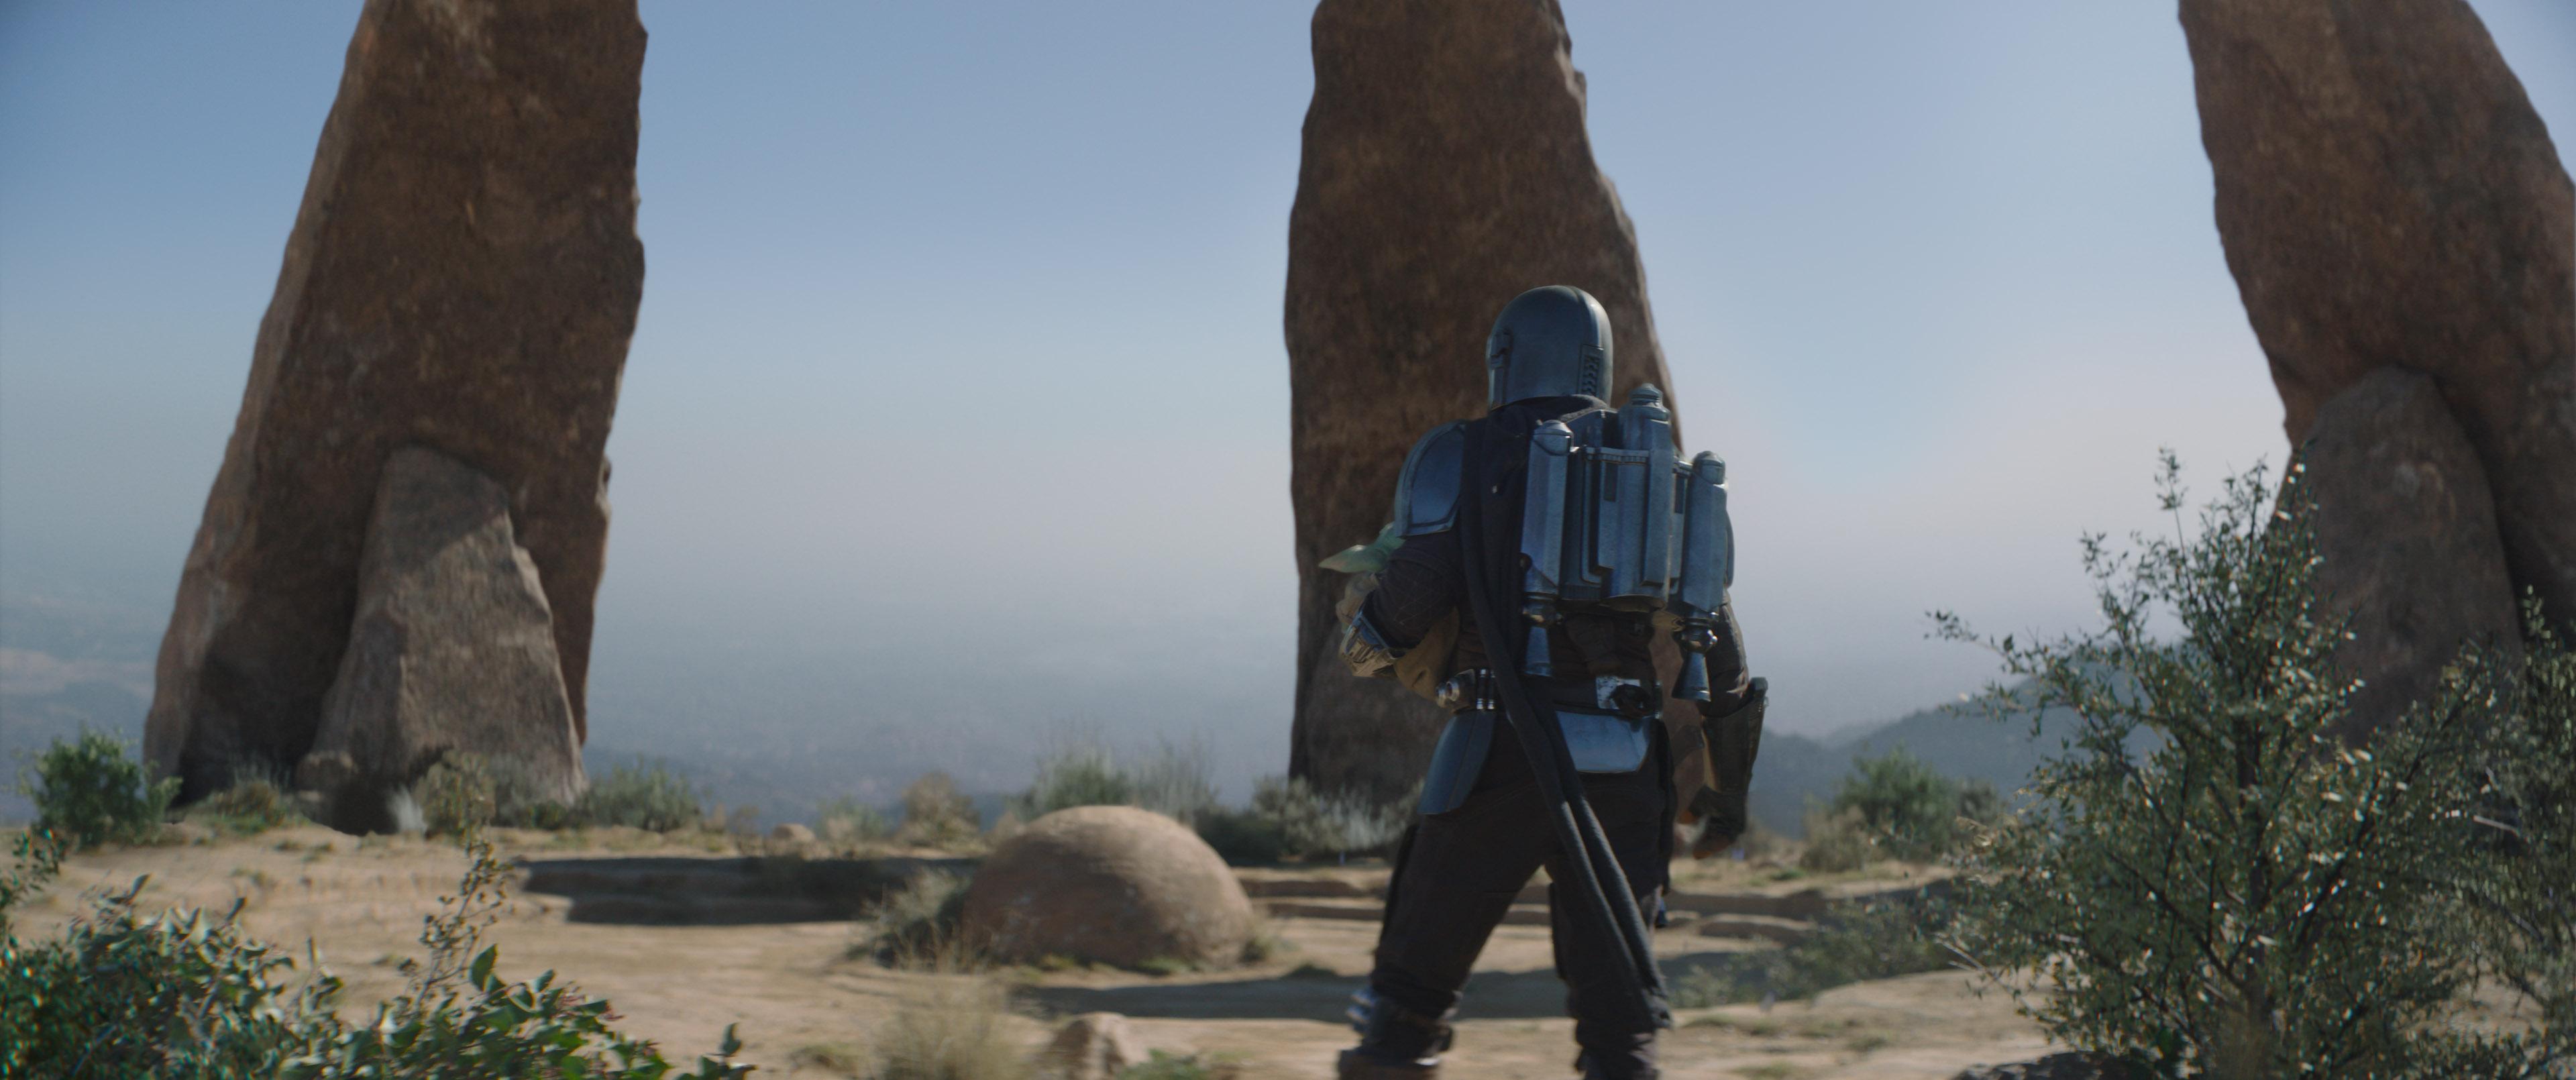 'Star Wars: The Mandalorian' Season 2 Episode 6